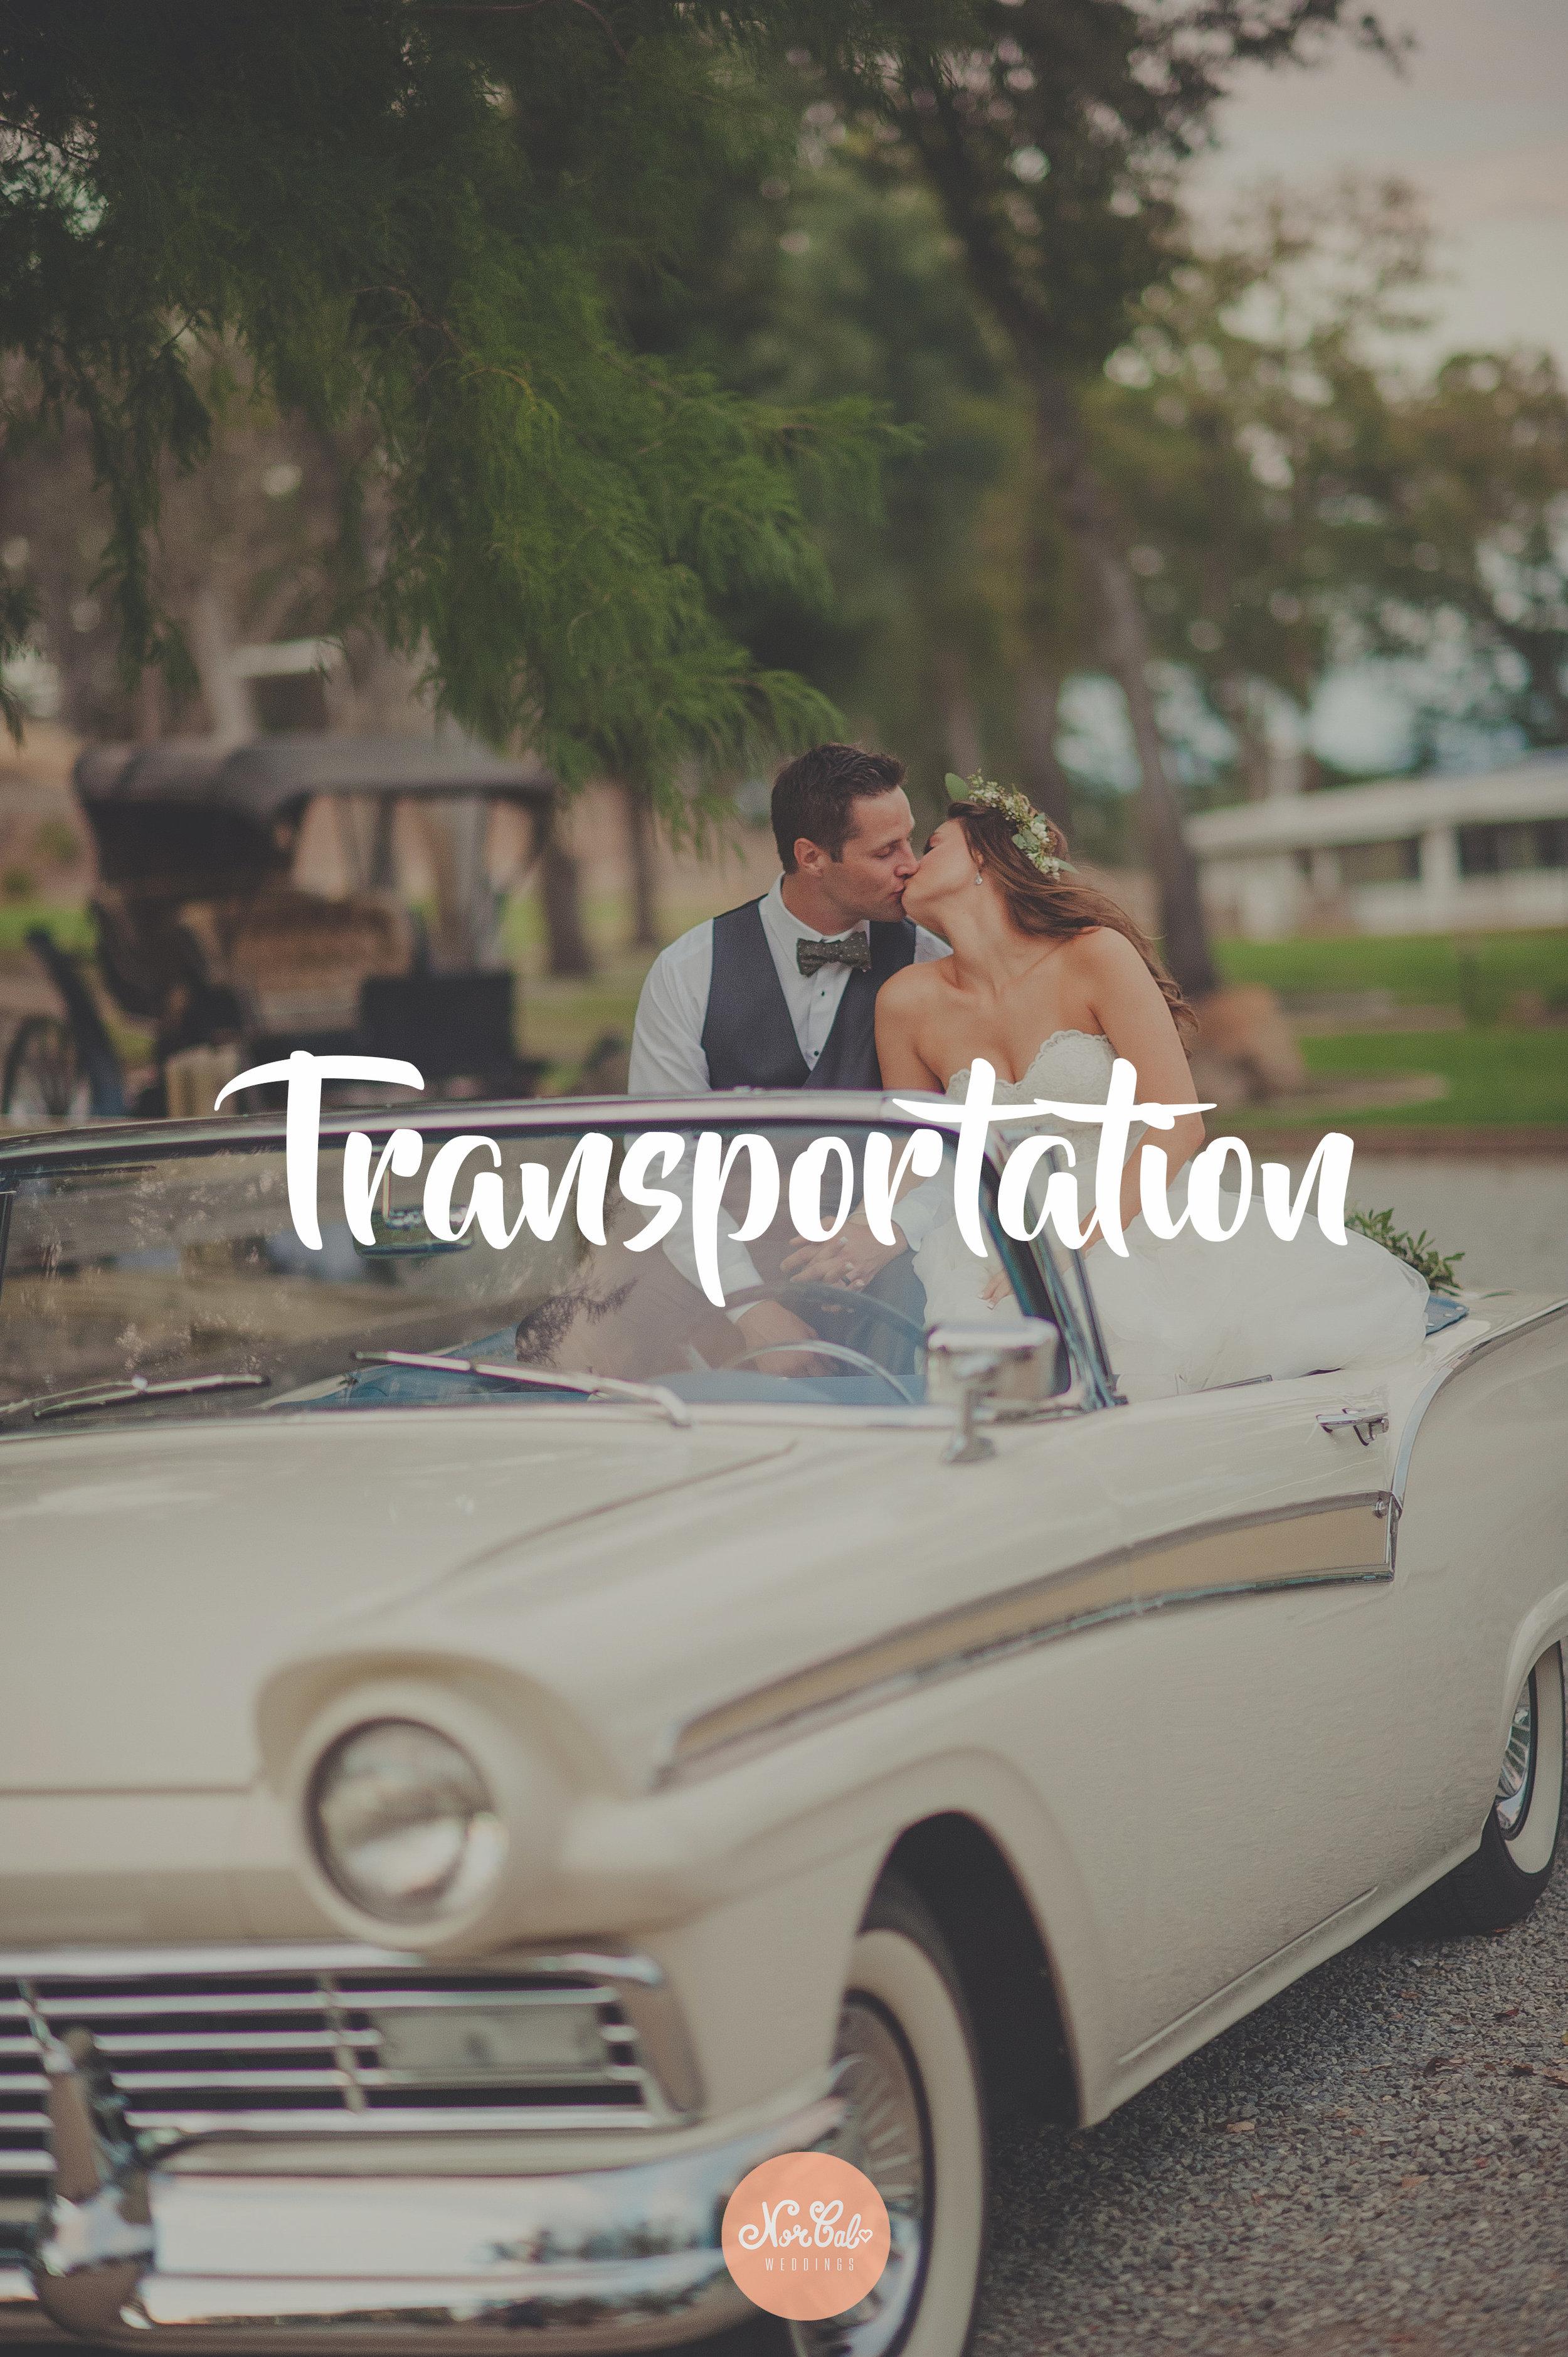 NorCal Weddings Transportation Services.jpg